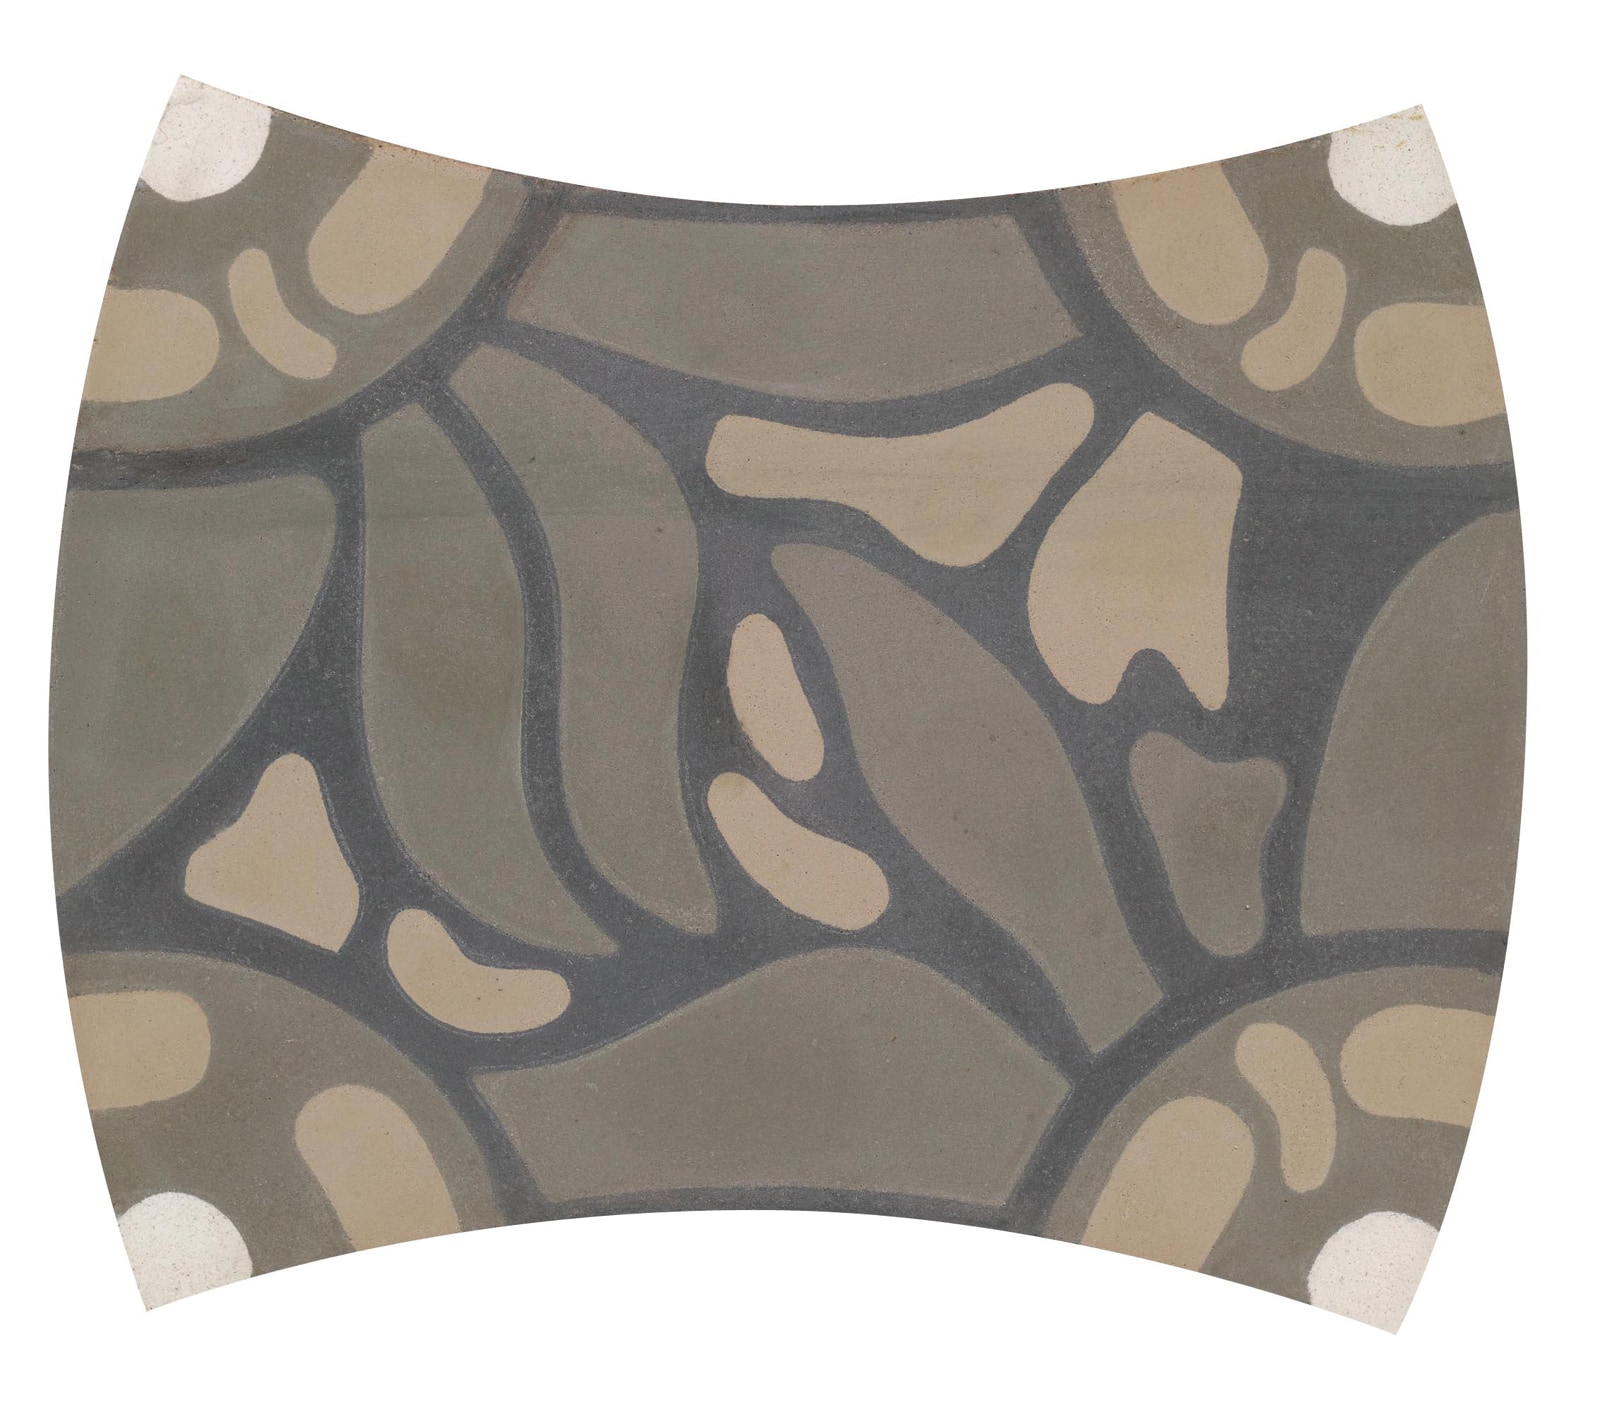 VIA_zementmosaikplatte-nummer-12154 | 22154